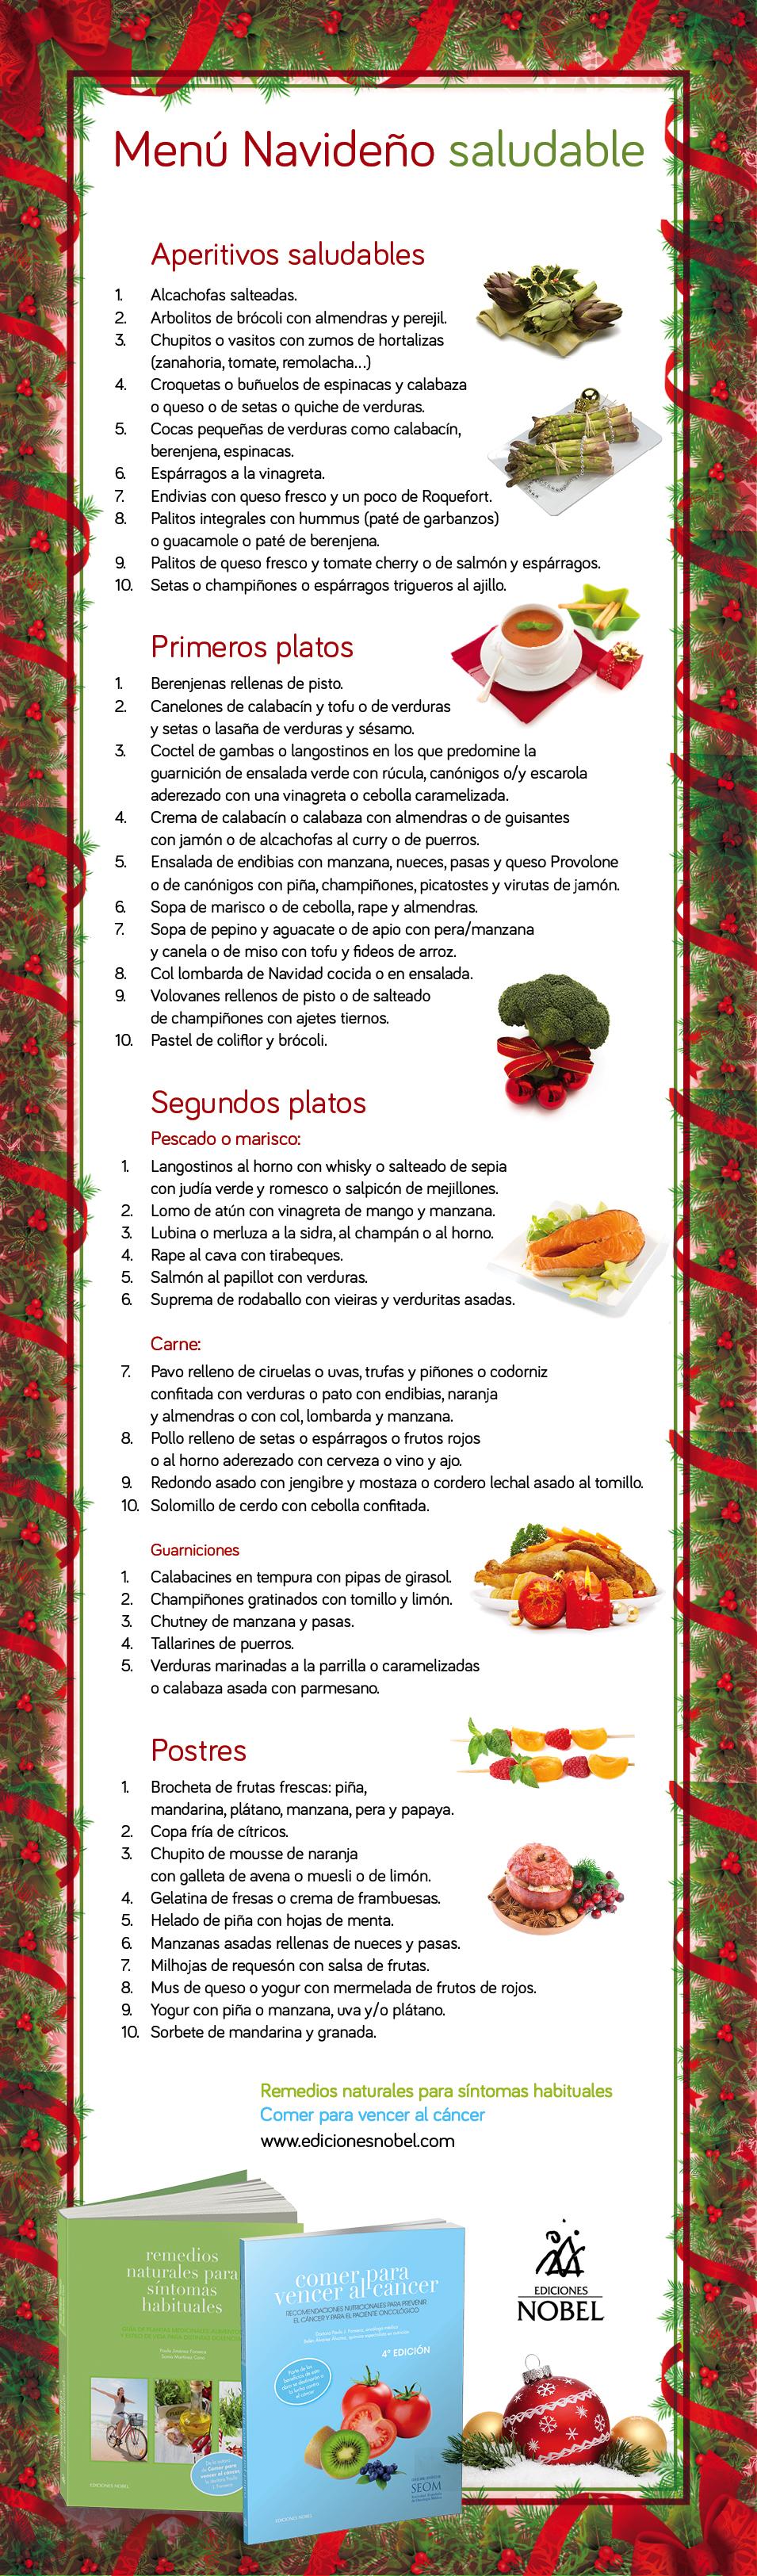 Menú navideño saludable